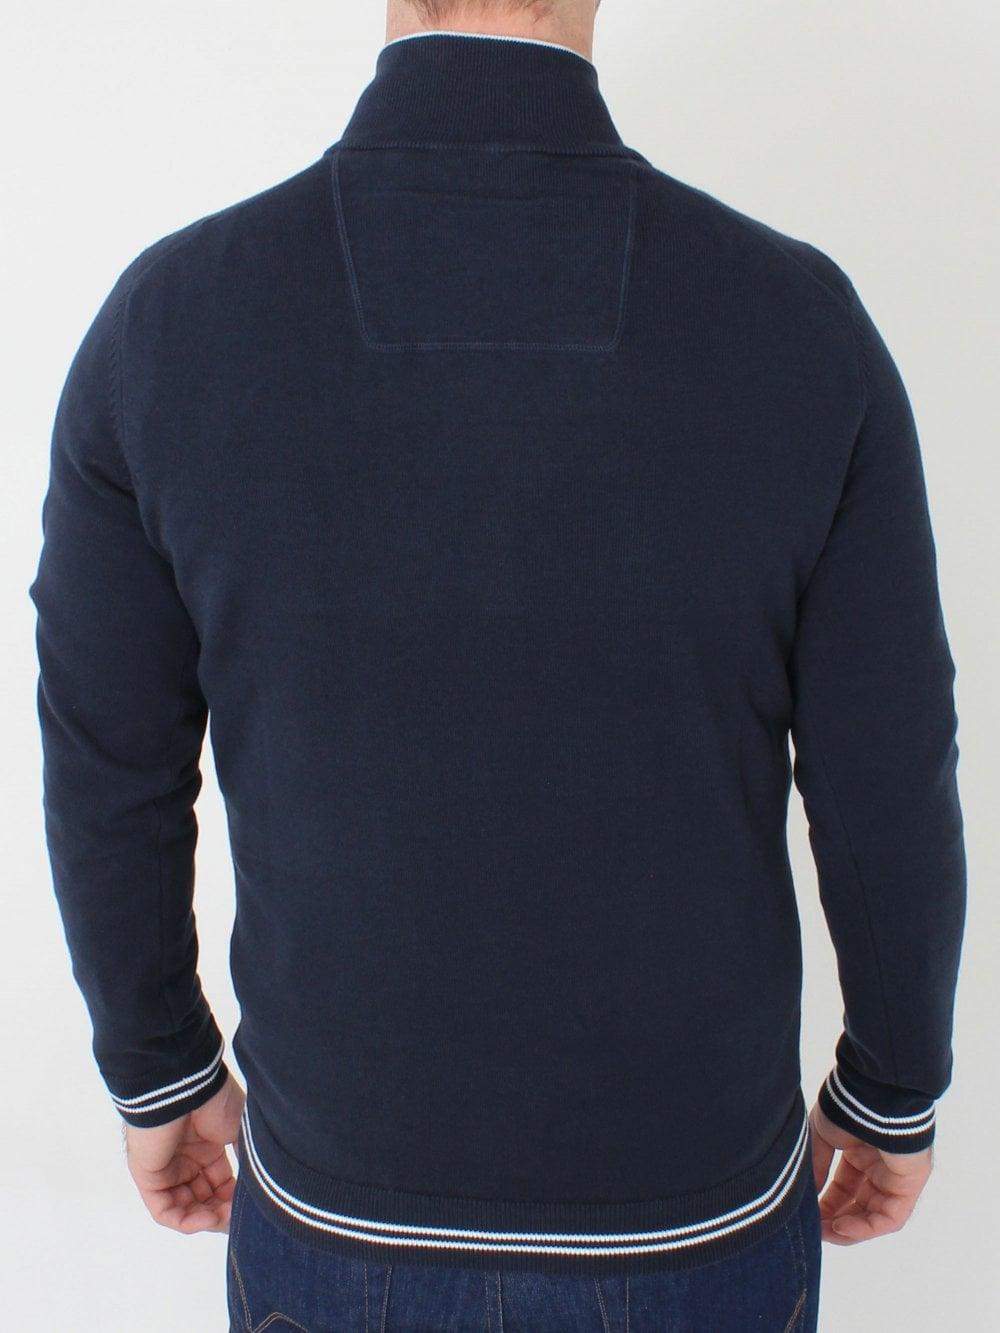 22f76d94a Hugo Boss Zimex 1/4 Zip Knit in Navy | Northern Threads